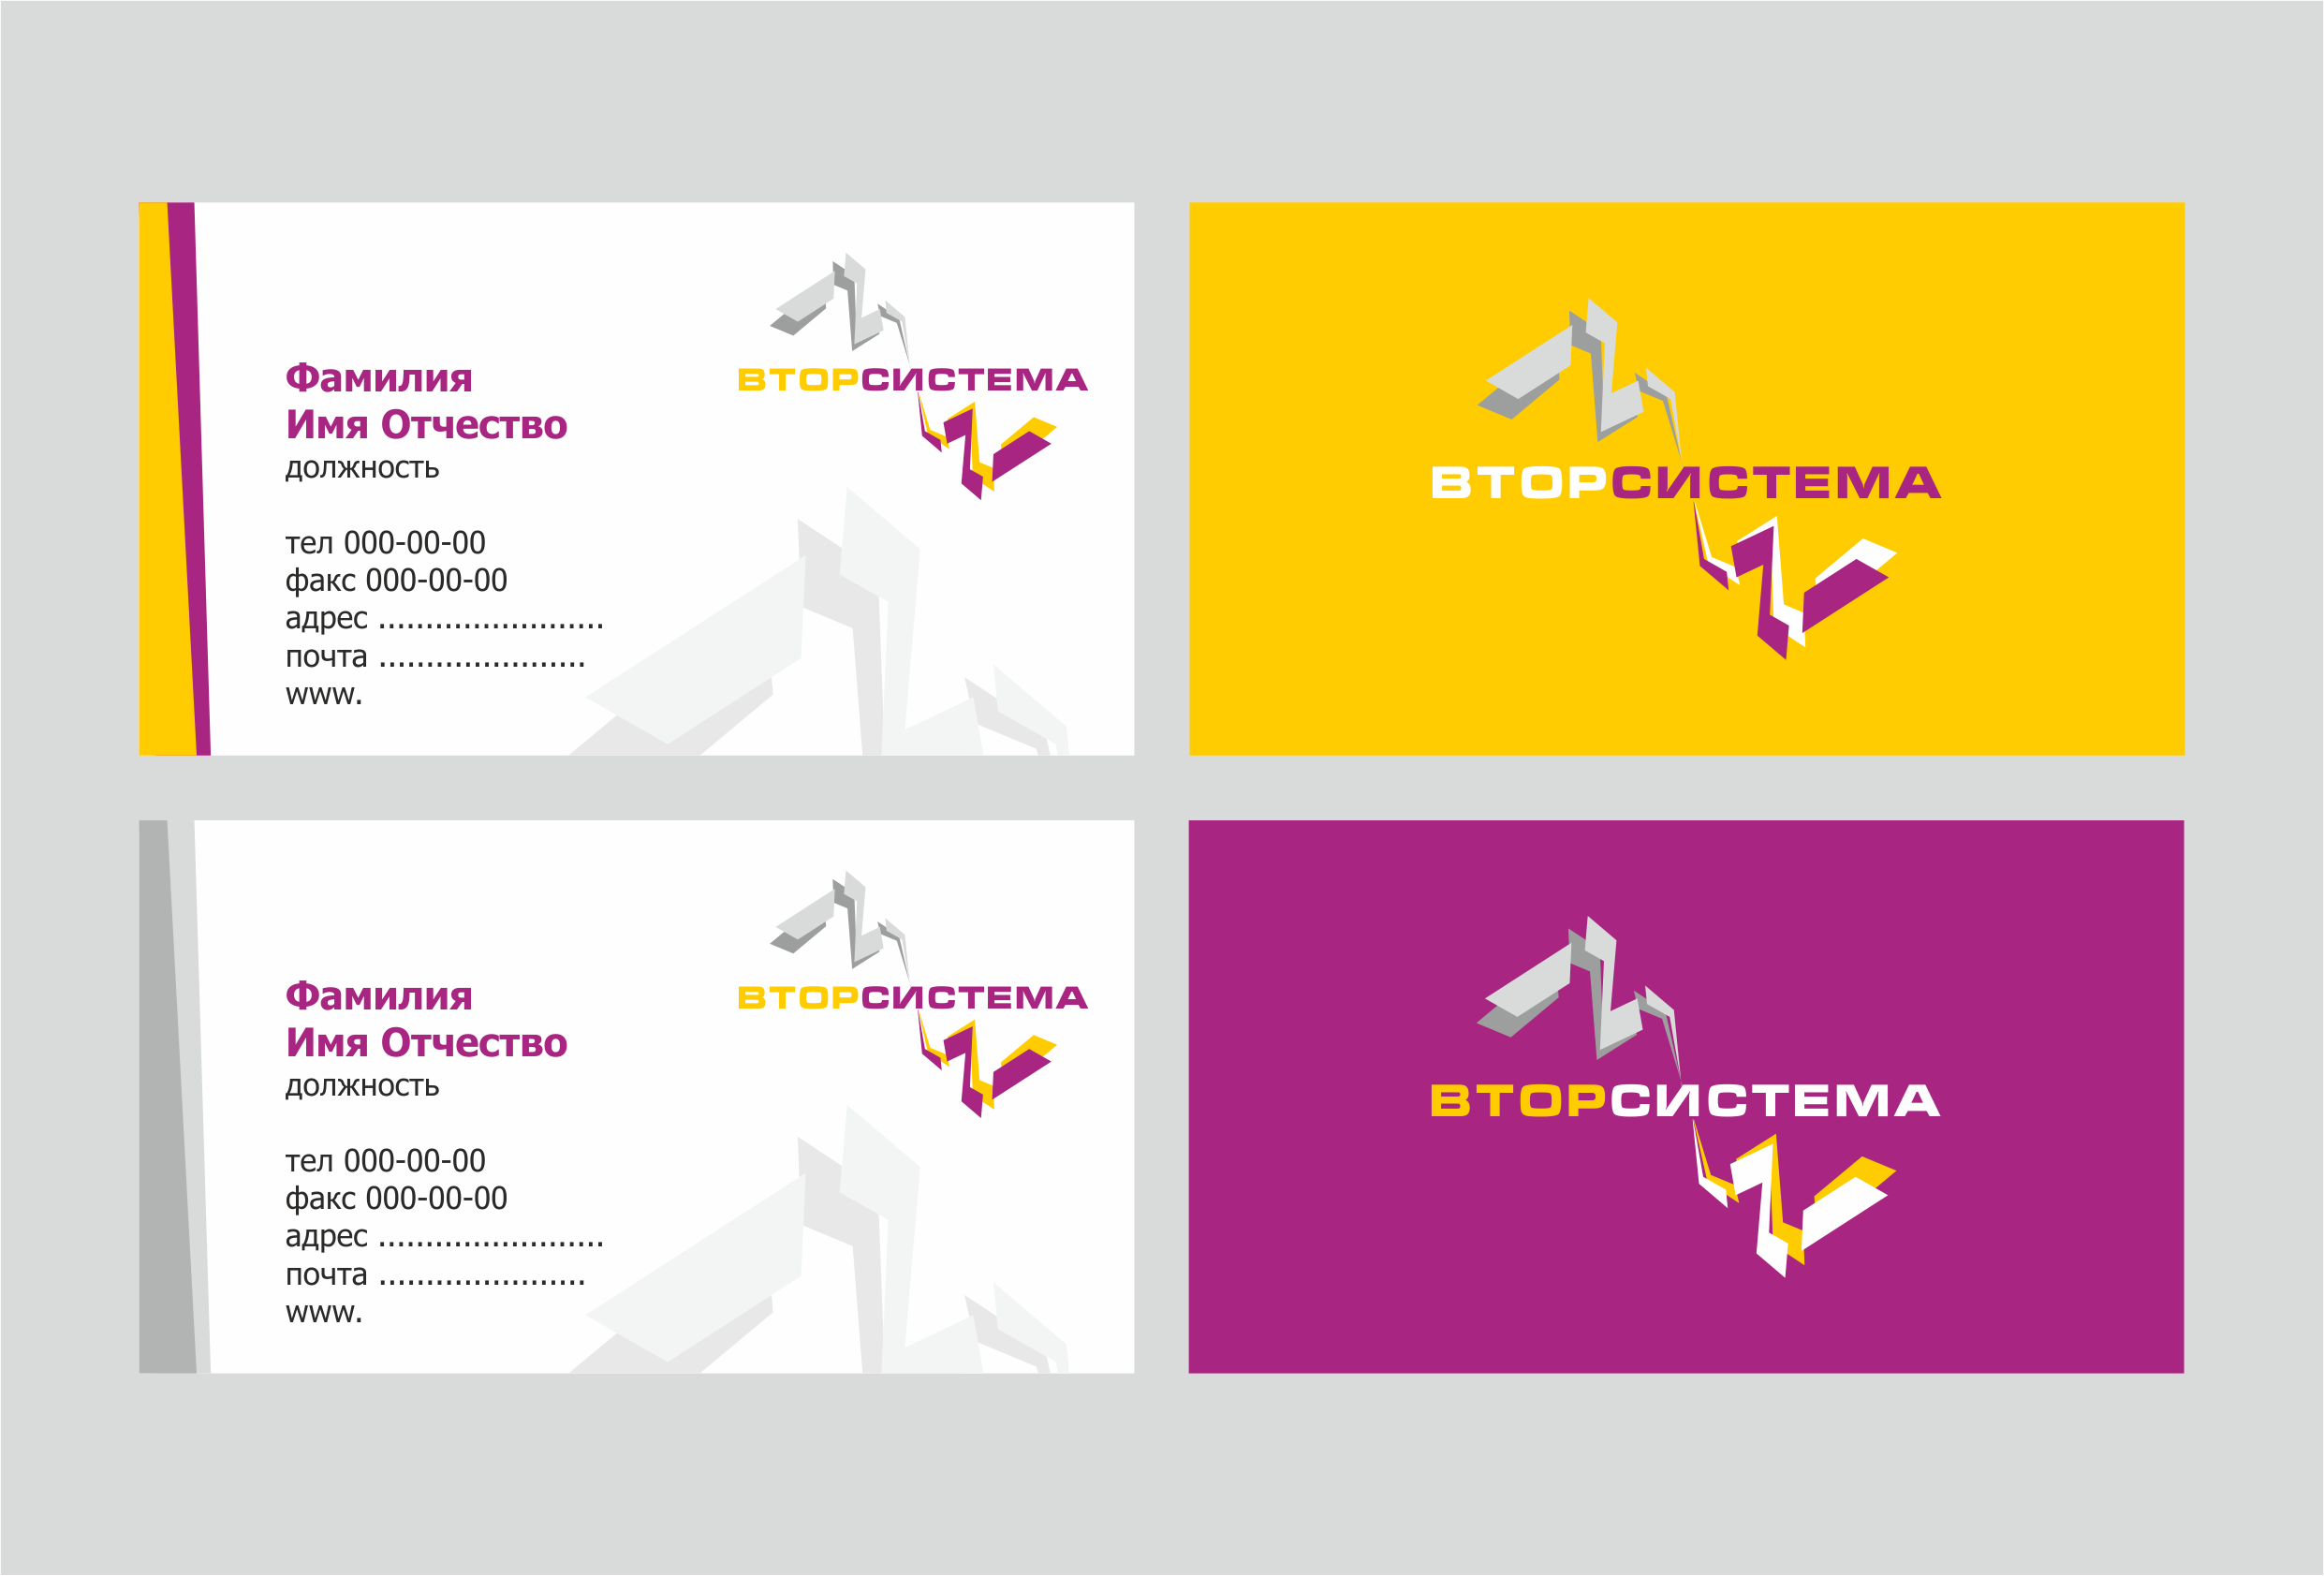 Нужно разработать логотип и дизайн визитки фото f_4105551dfb641def.png